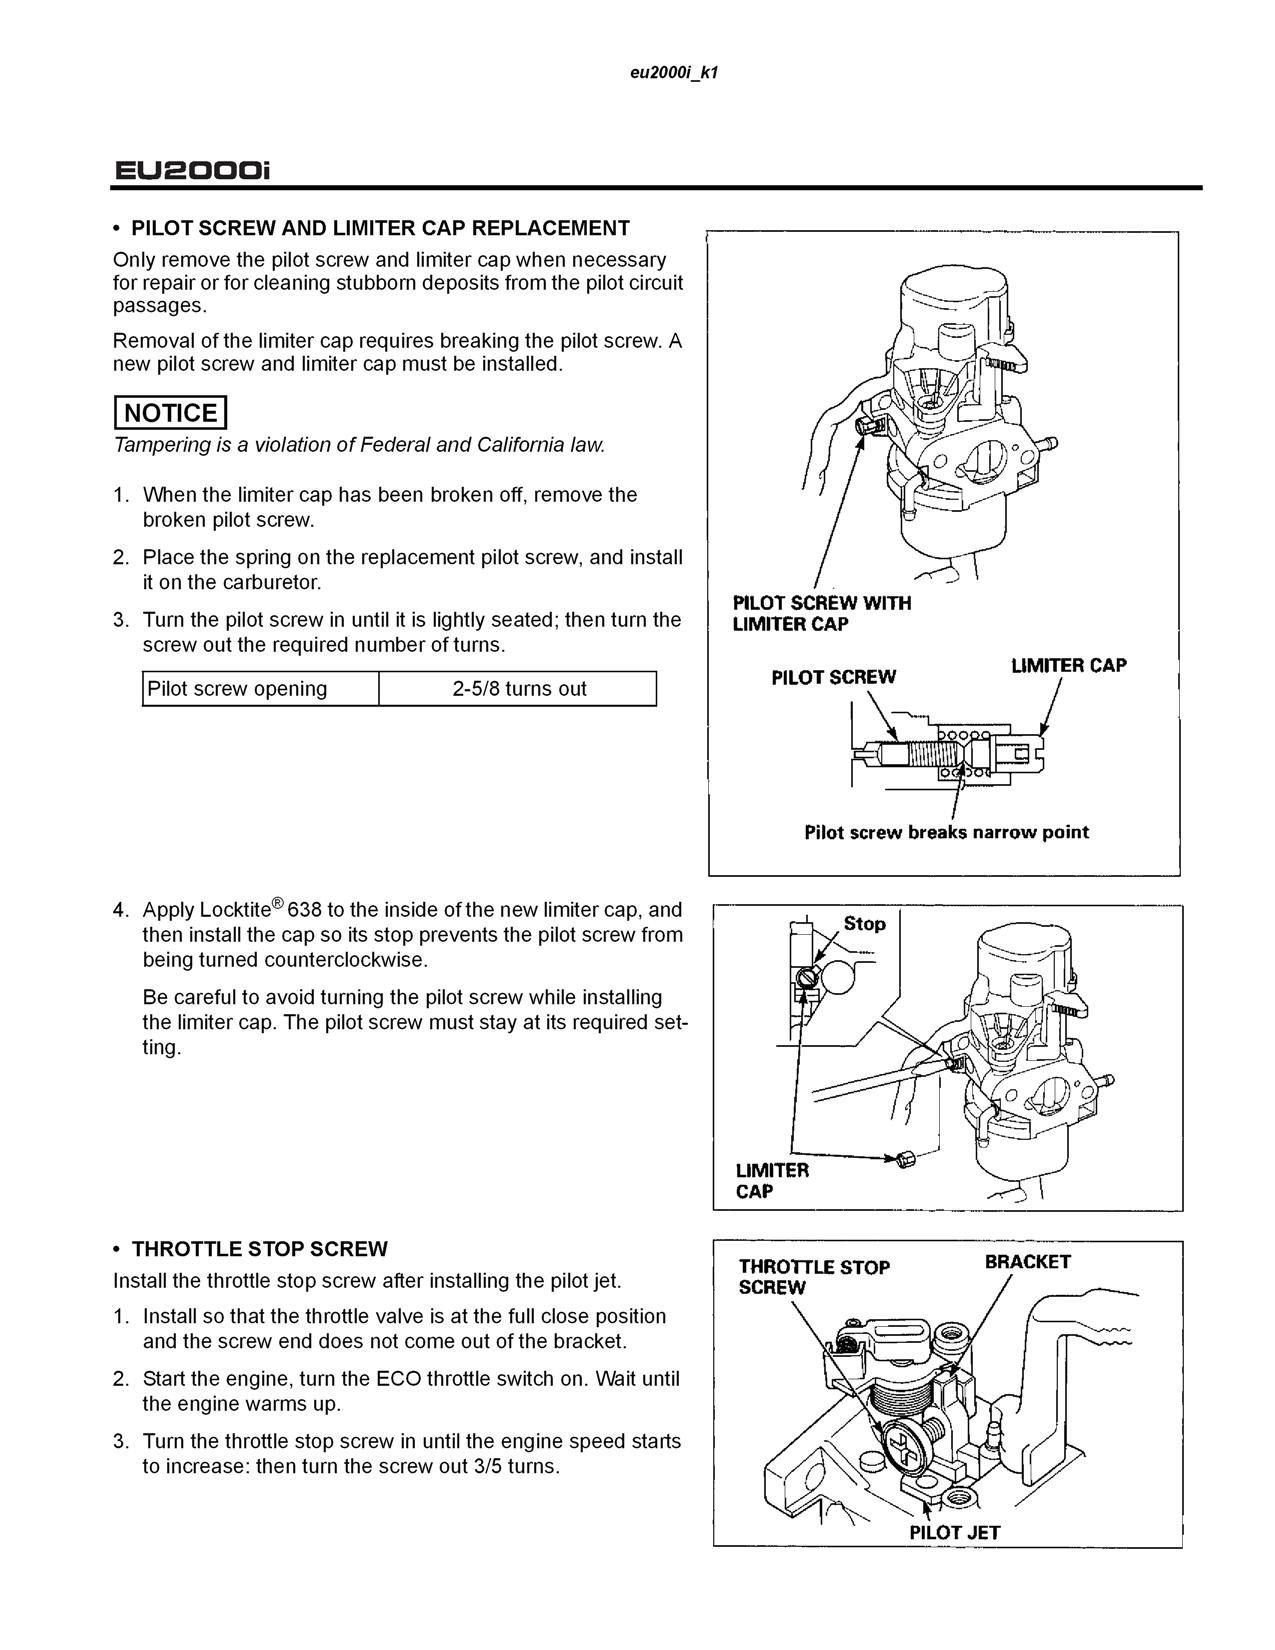 Diagram Of Honda Generator Parts Eb5000x A Generator Jpn Vin Ea7